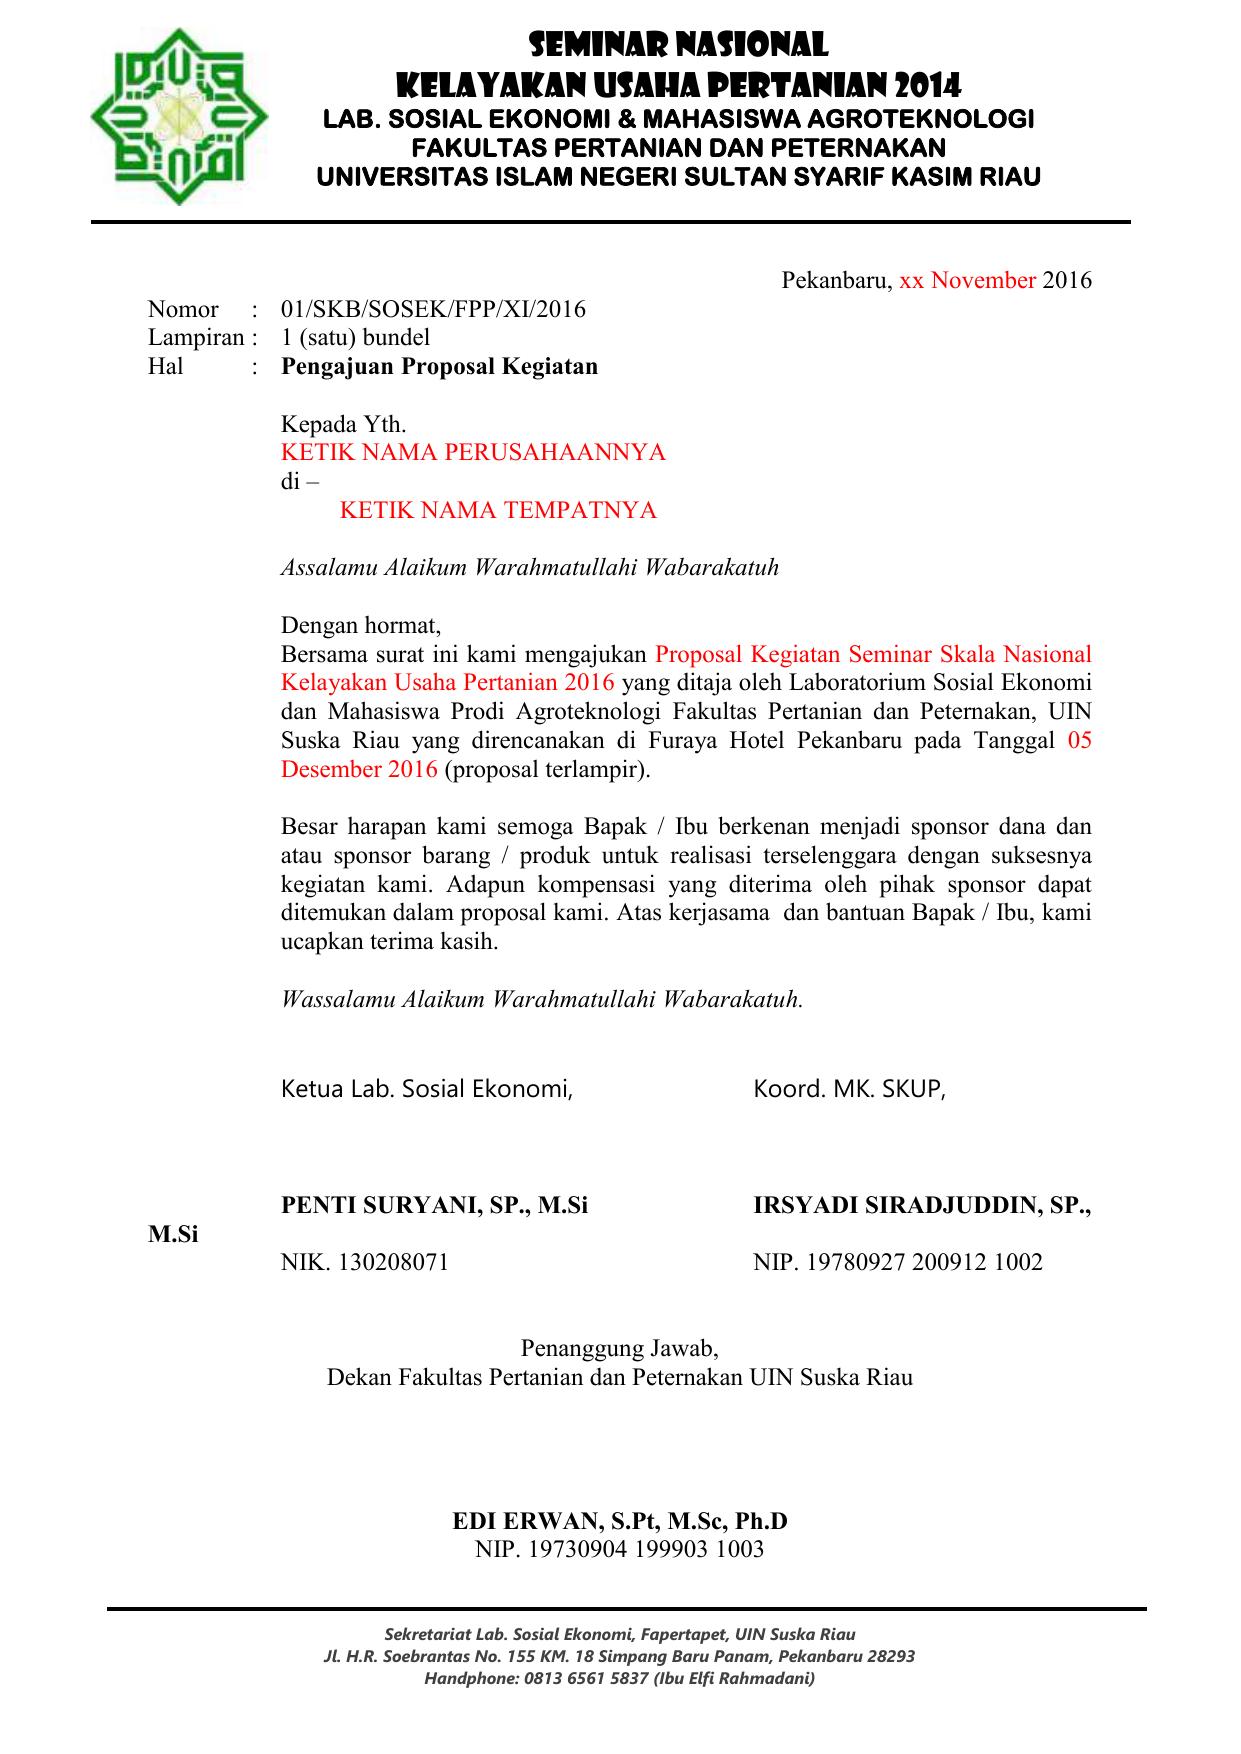 Proposal Prodi Agroteknologi Fapertapet Uin Suska Riau